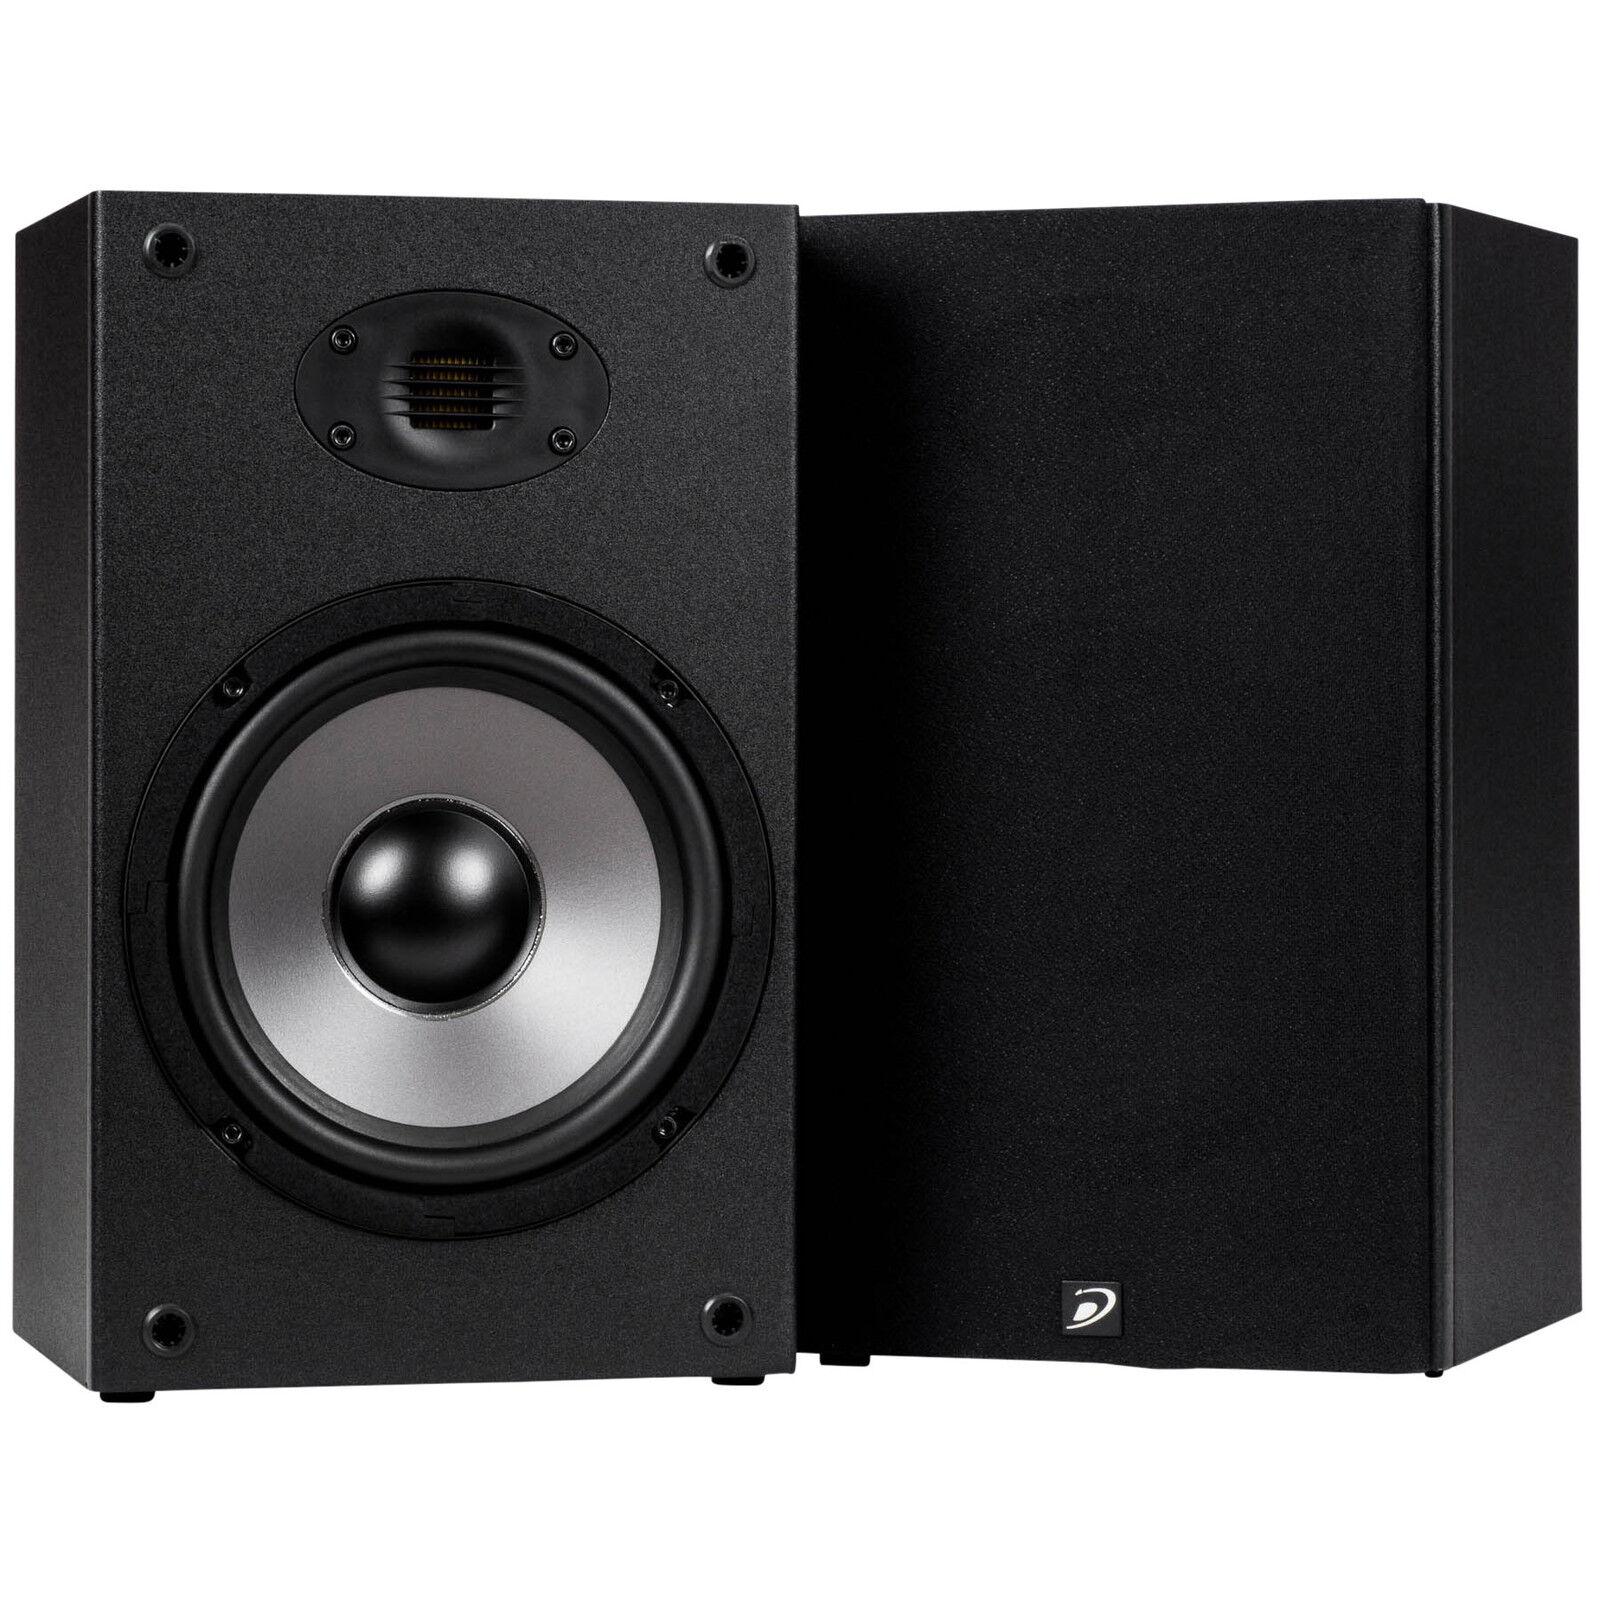 Dayton Audio B652-AIR 6-1 2  Bookshelf Speaker Pair with AMT Tweeter